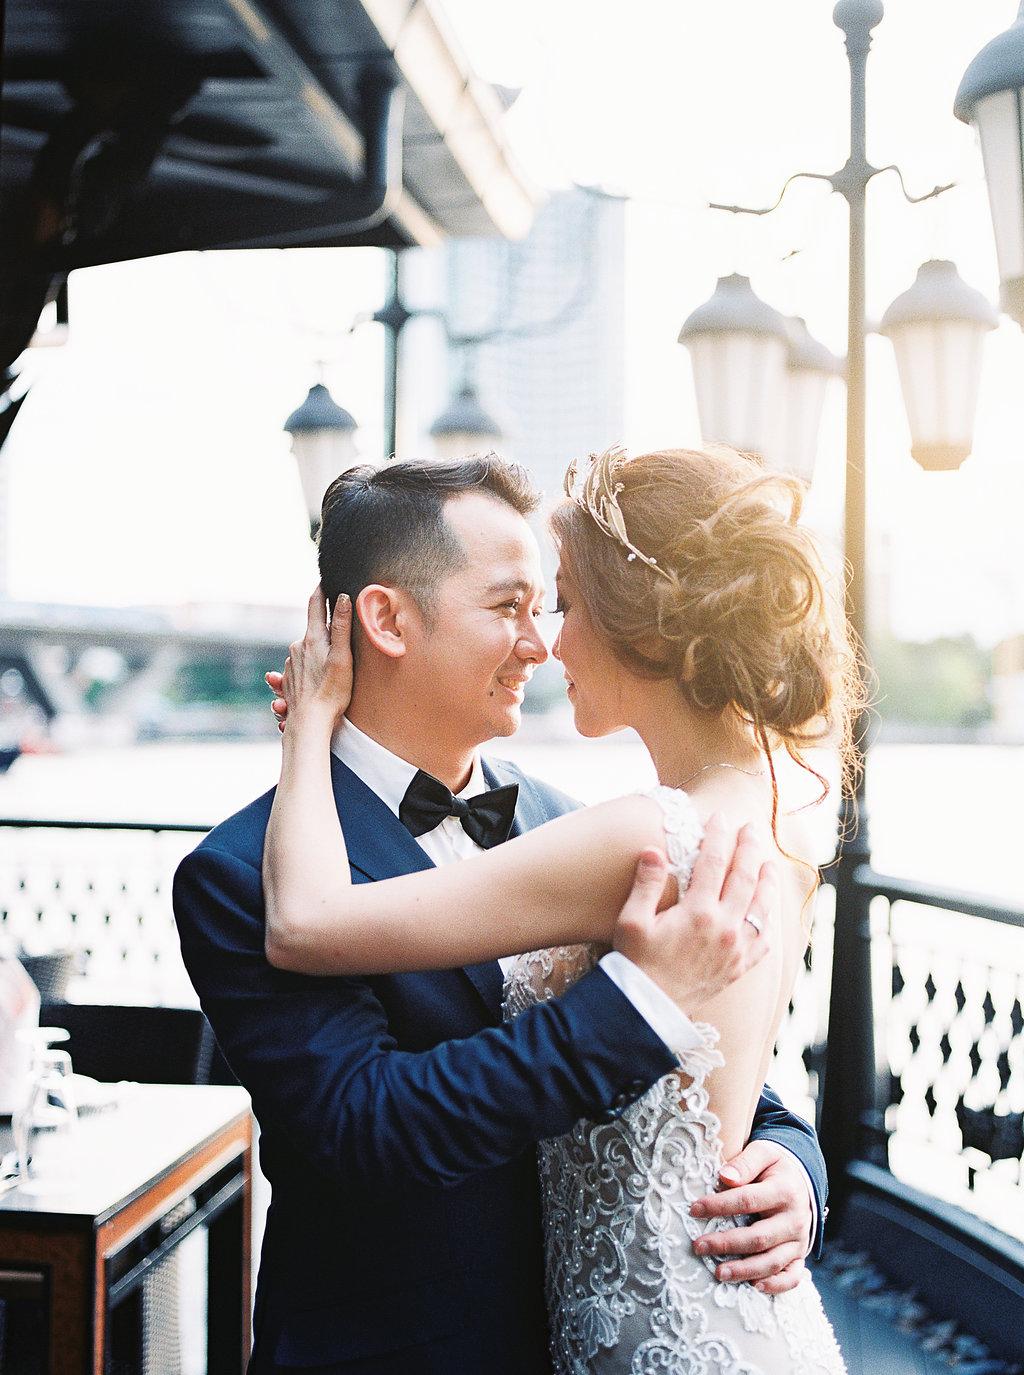 Luxe destination wedding in Jakarta and Bankok | fine art film wedding photographer Tanja Kibogo 5003.JPG